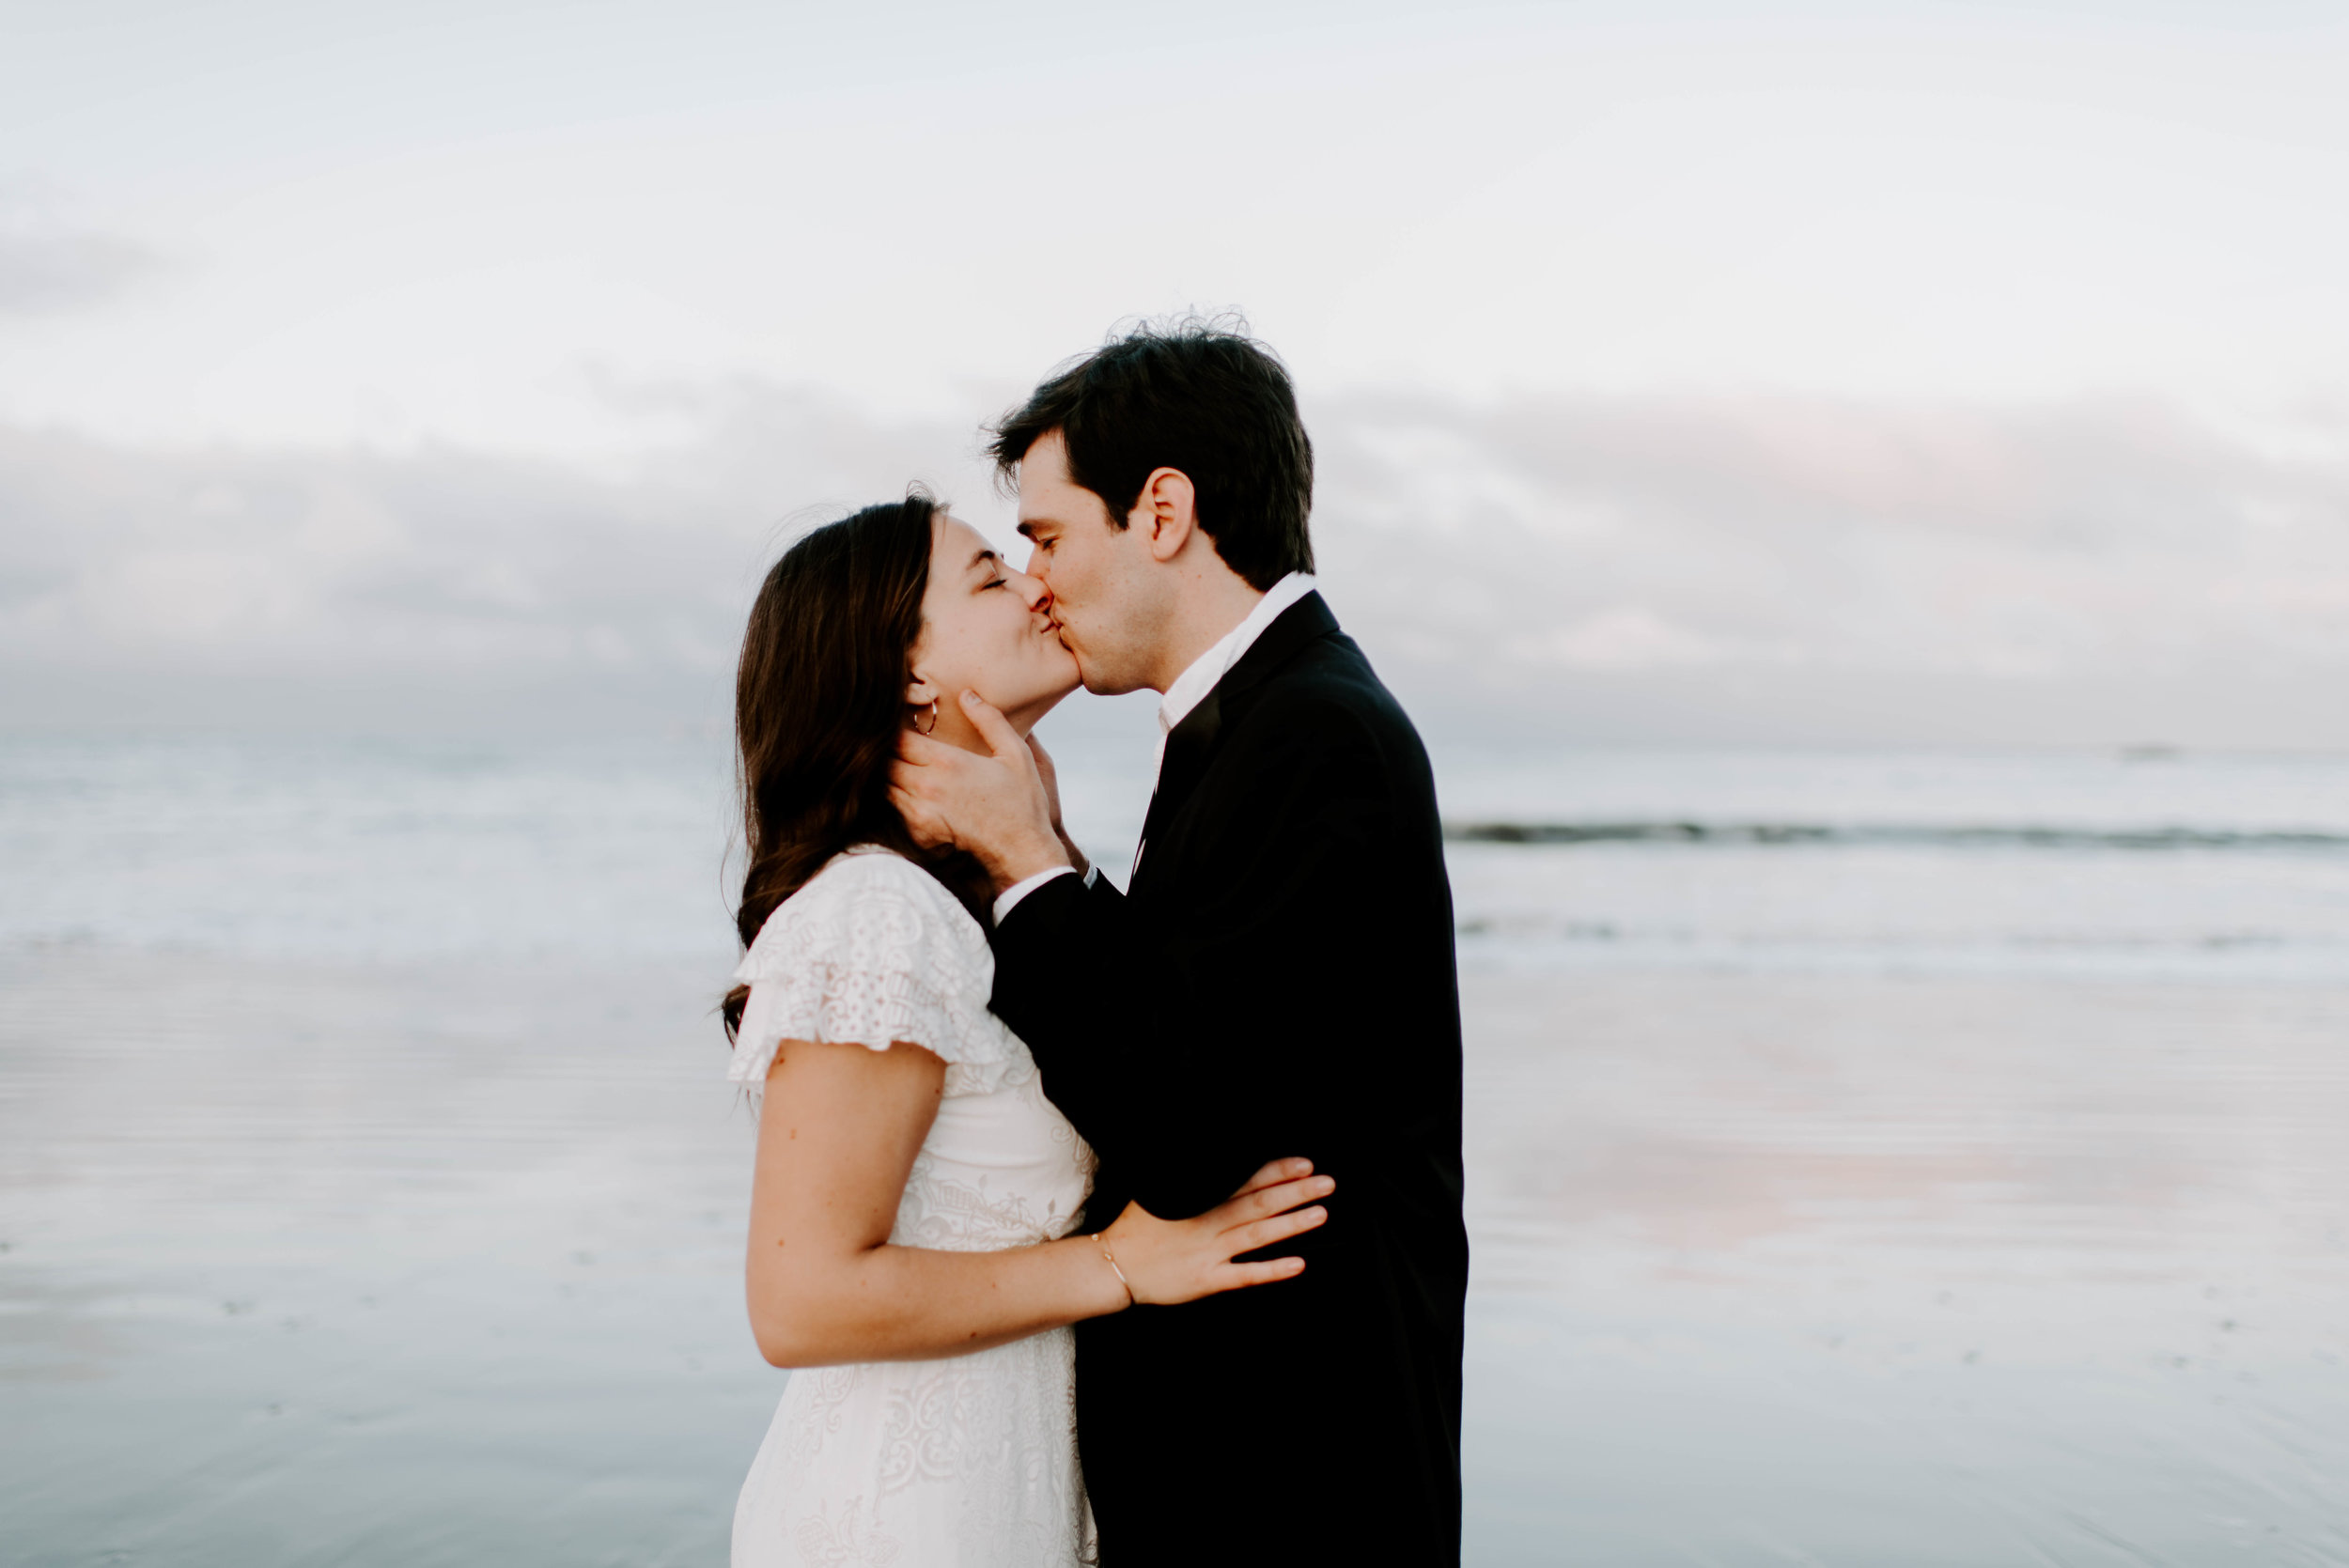 maryandnick_couplessession_cdupont-54.jpg